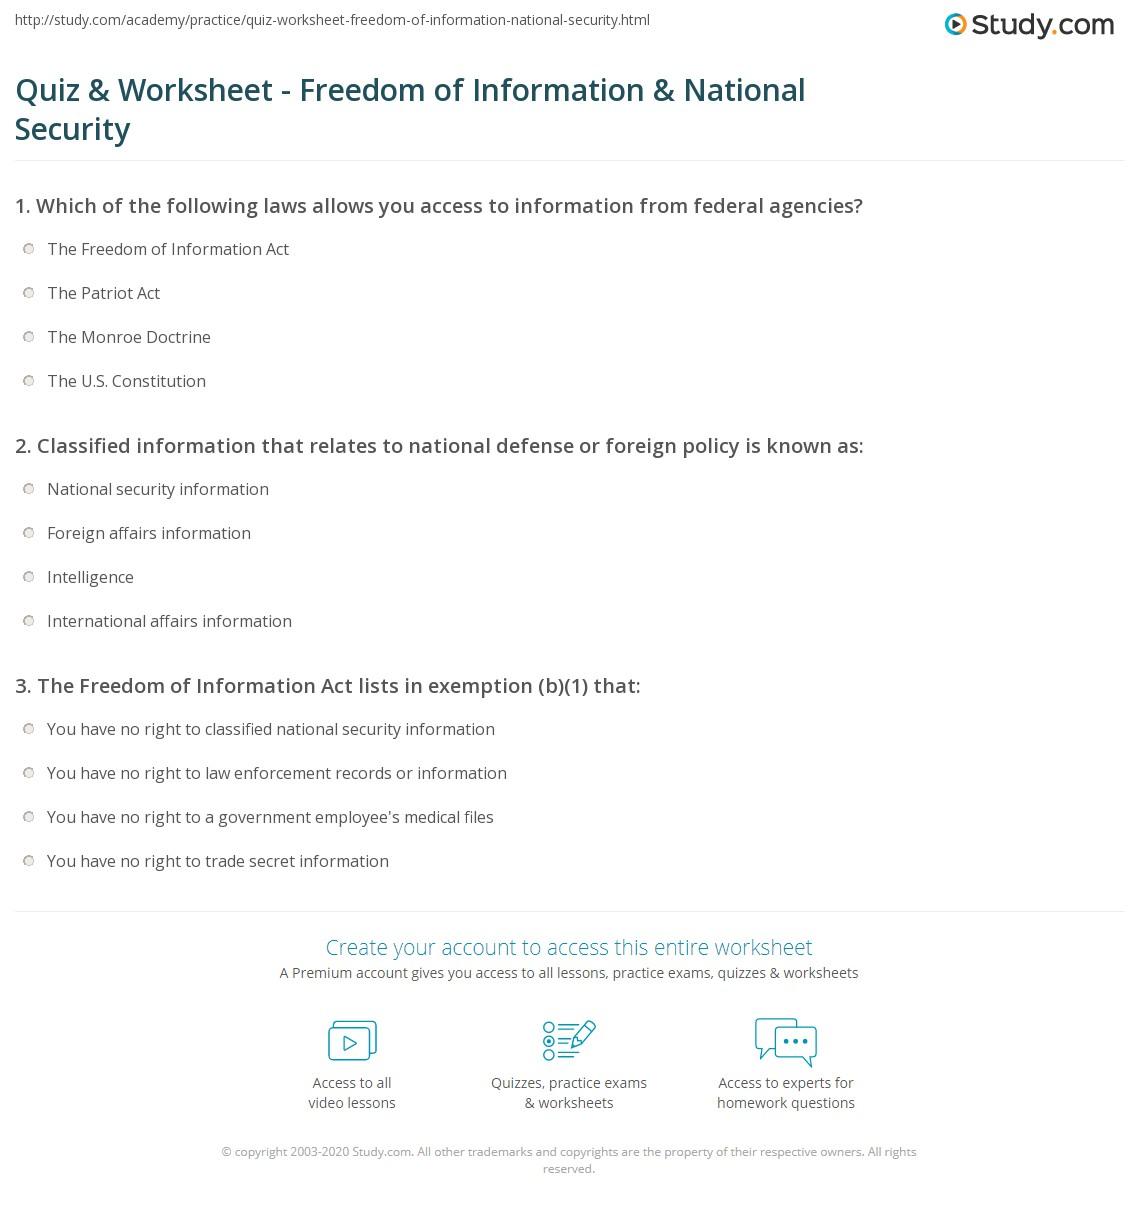 Quiz & Worksheet - Freedom of Information & National